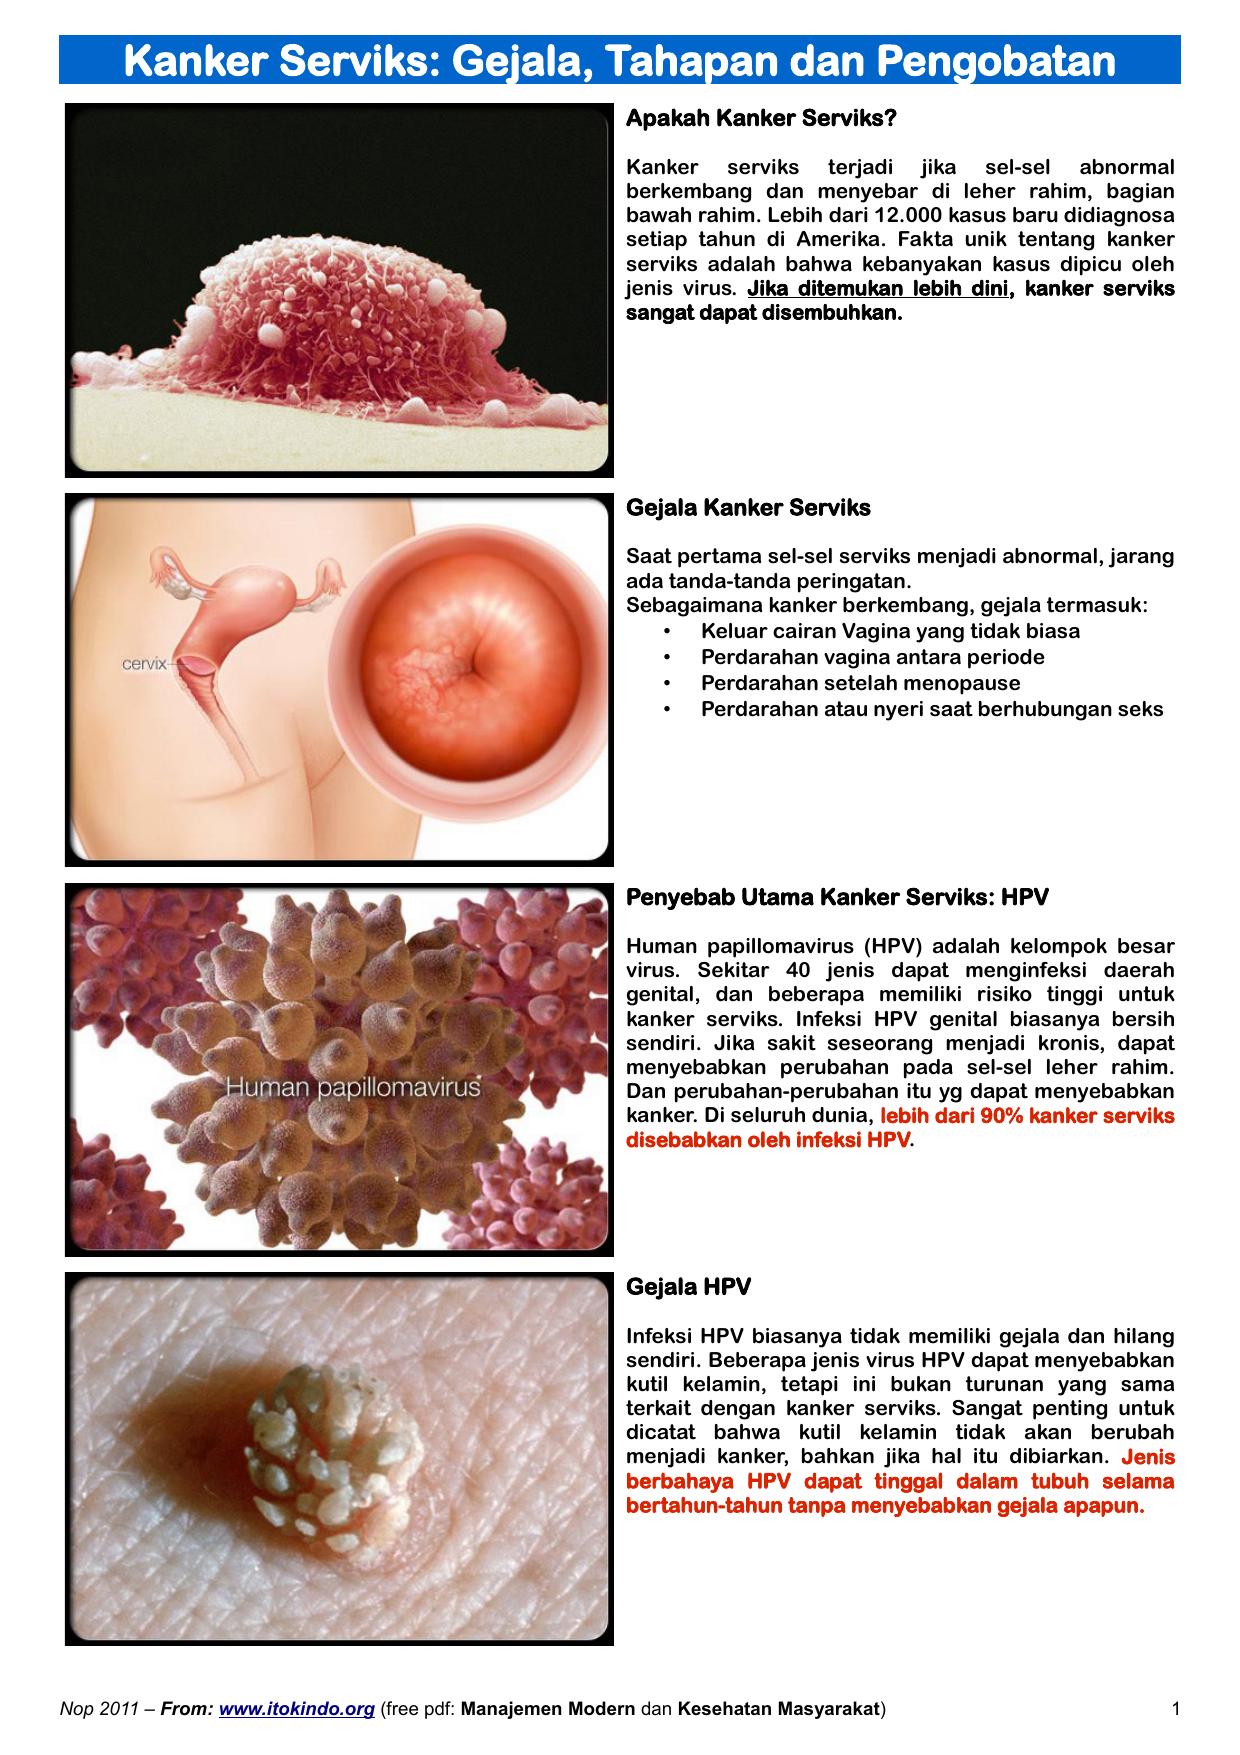 human papilloma adalah schistosomiasis mansoni